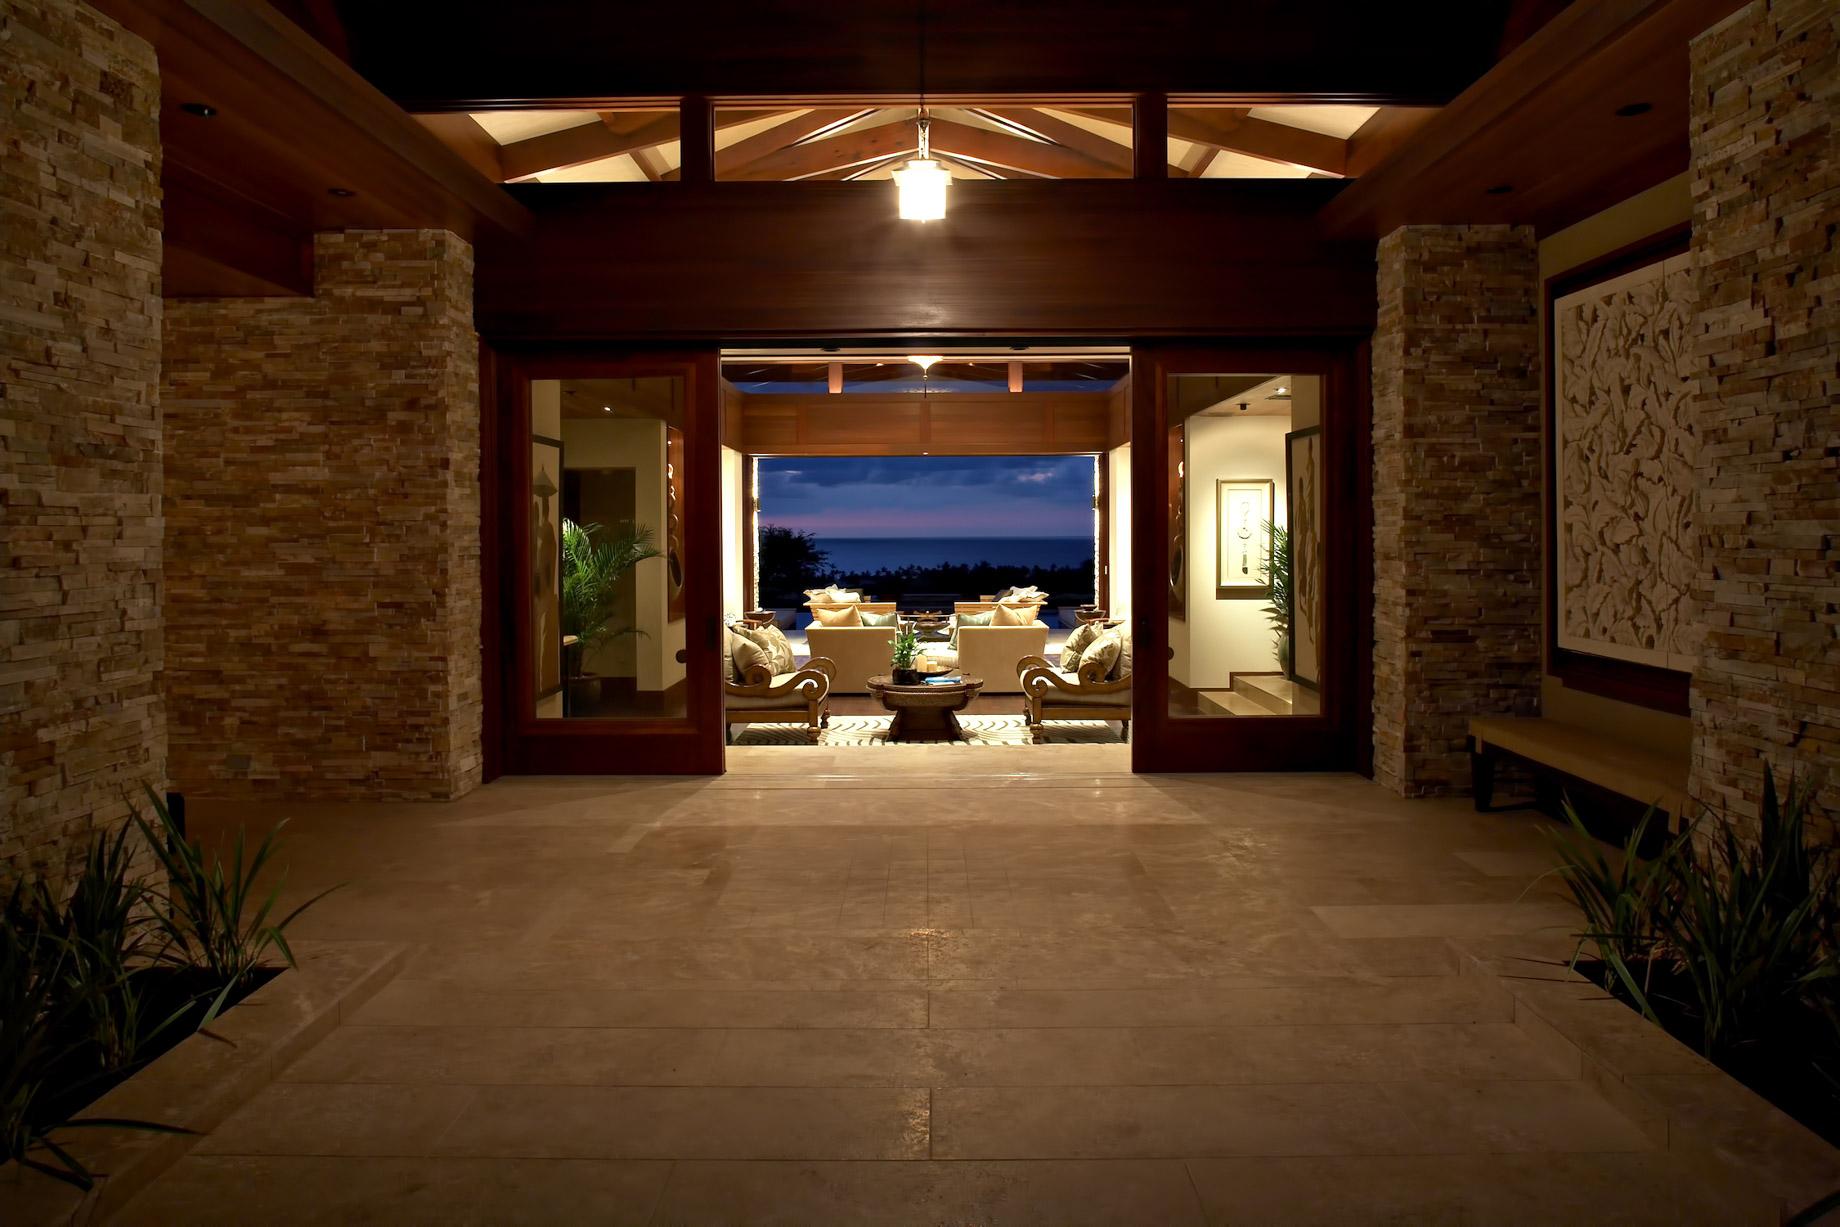 Cher's Former Hawaiian Residence – 72-122 Laueki St, Kailua-Kona, HI, USA